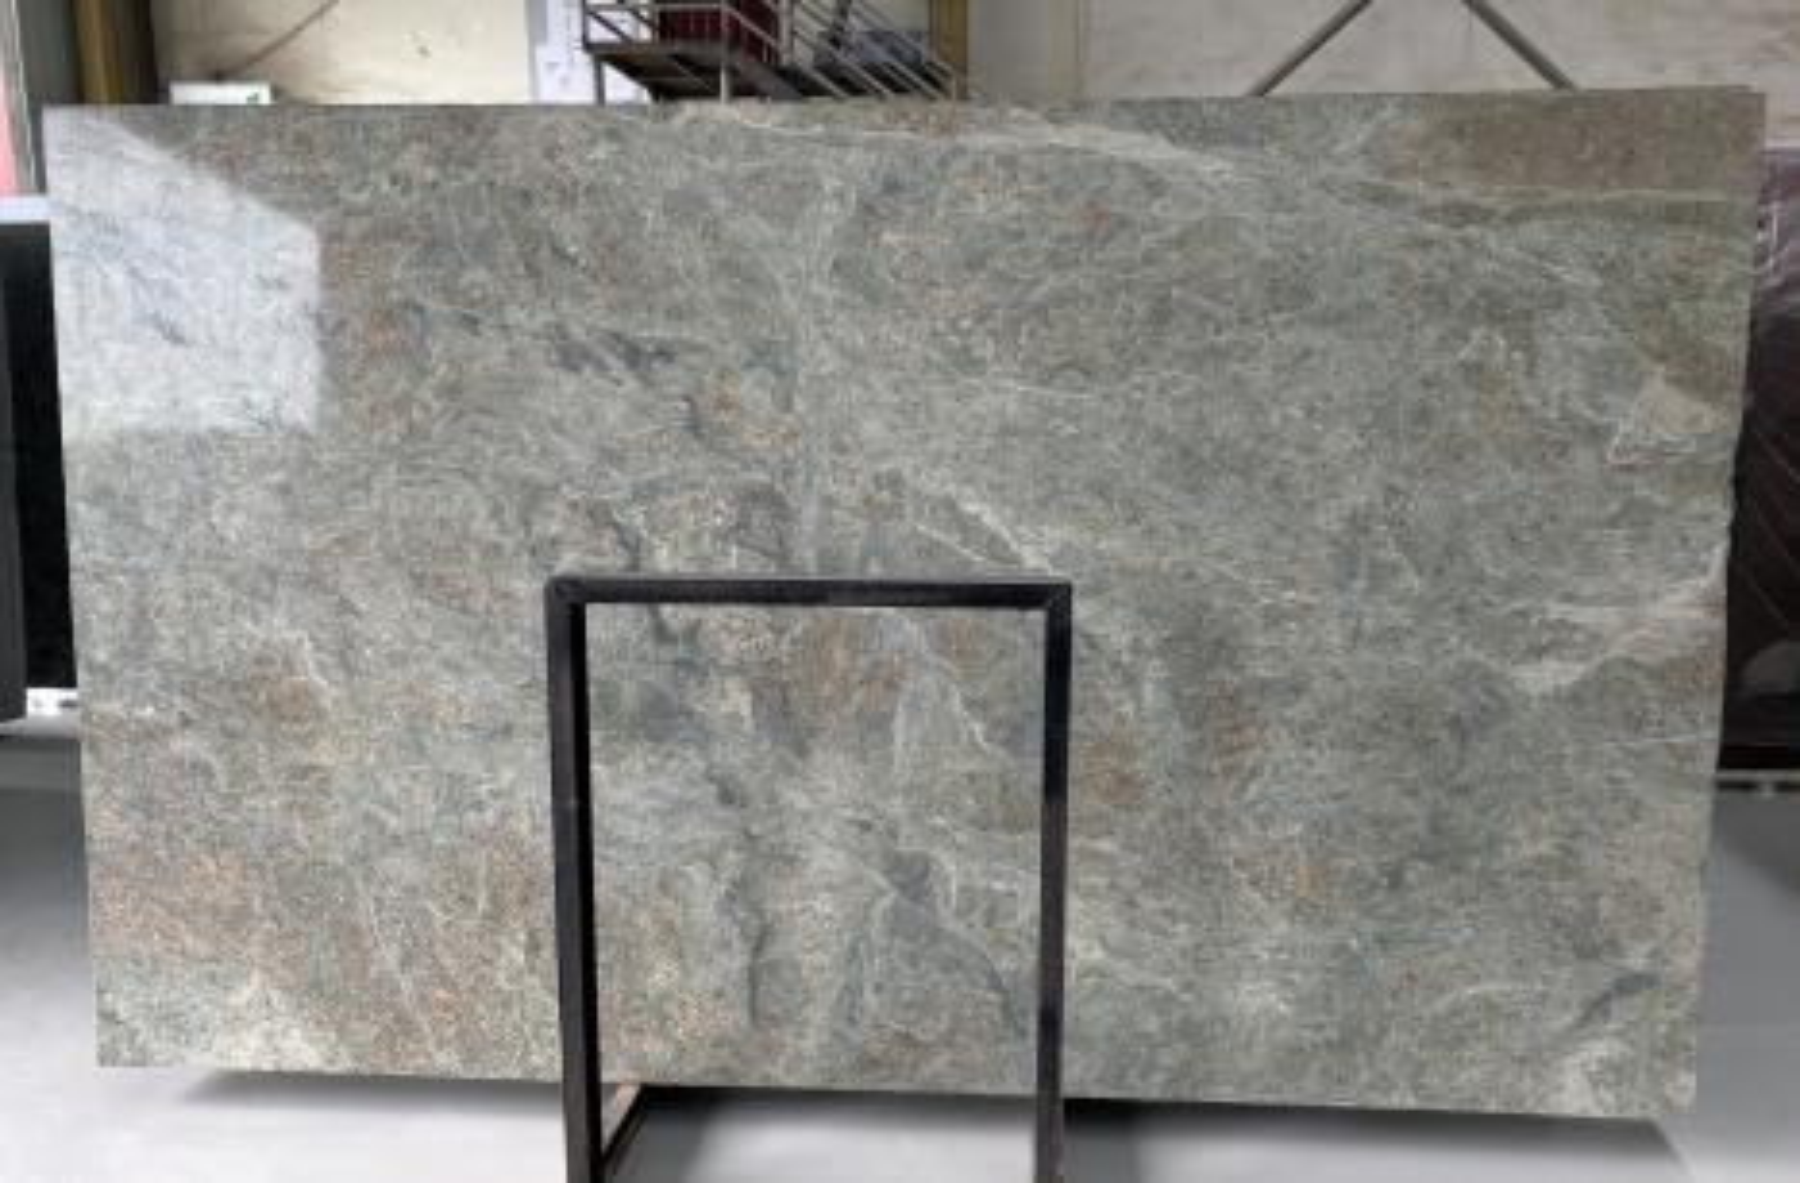 LT GREEN polierte Unmaßplatten D2109 aus Natur Granit , Bundle #02: Lieferung Fujian, China